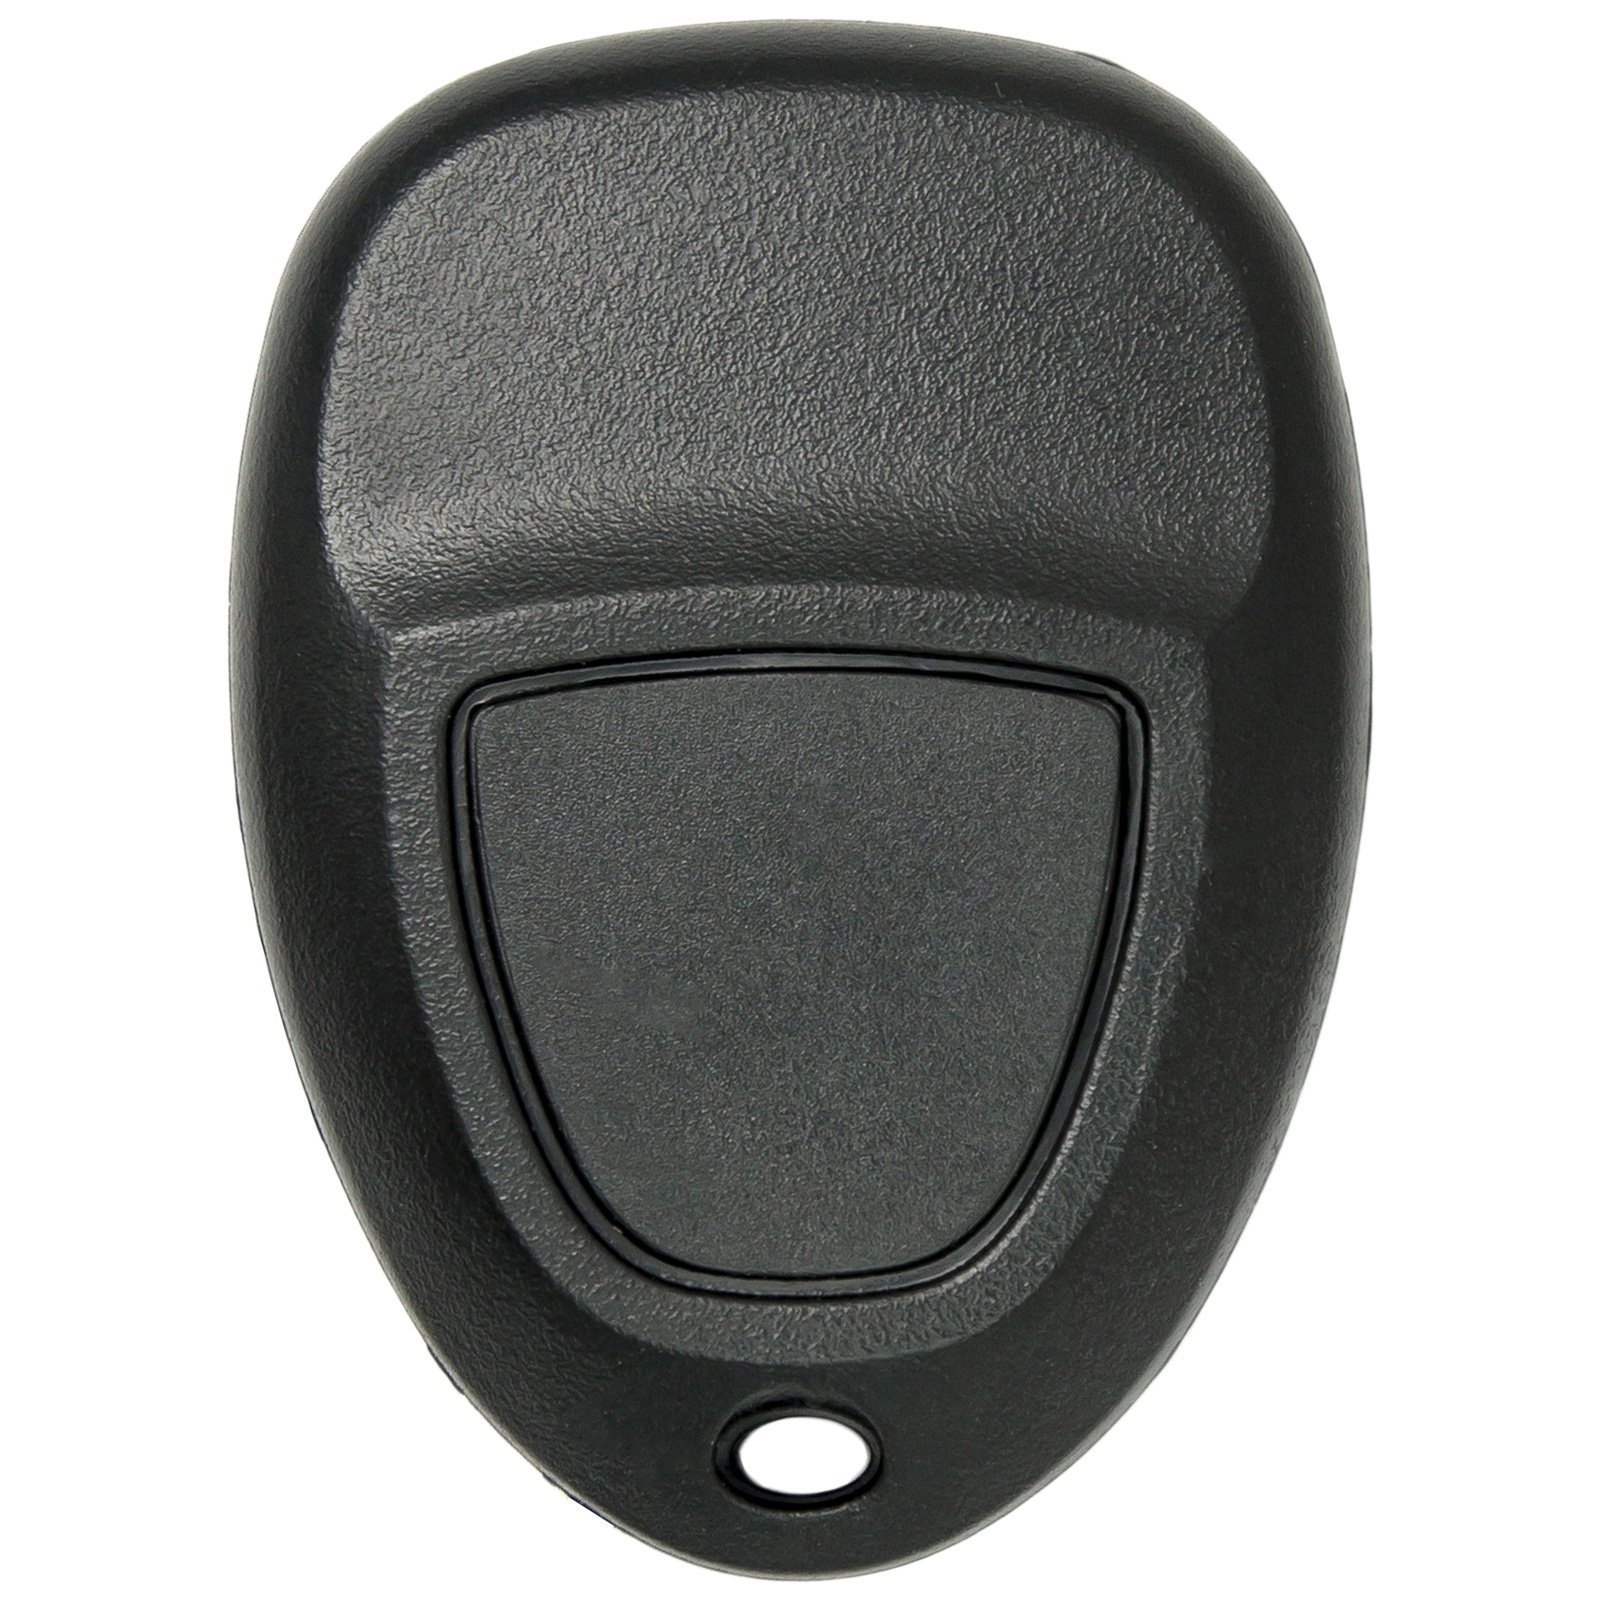 Keyless2Go 2 New Replacement Keyless Entry Remote Start Car Key Fob for 22733524 KOBGT04A Malibu Cobalt G5 G6 Grand Prix LaCrosse Allure by Keyless2Go (Image #2)